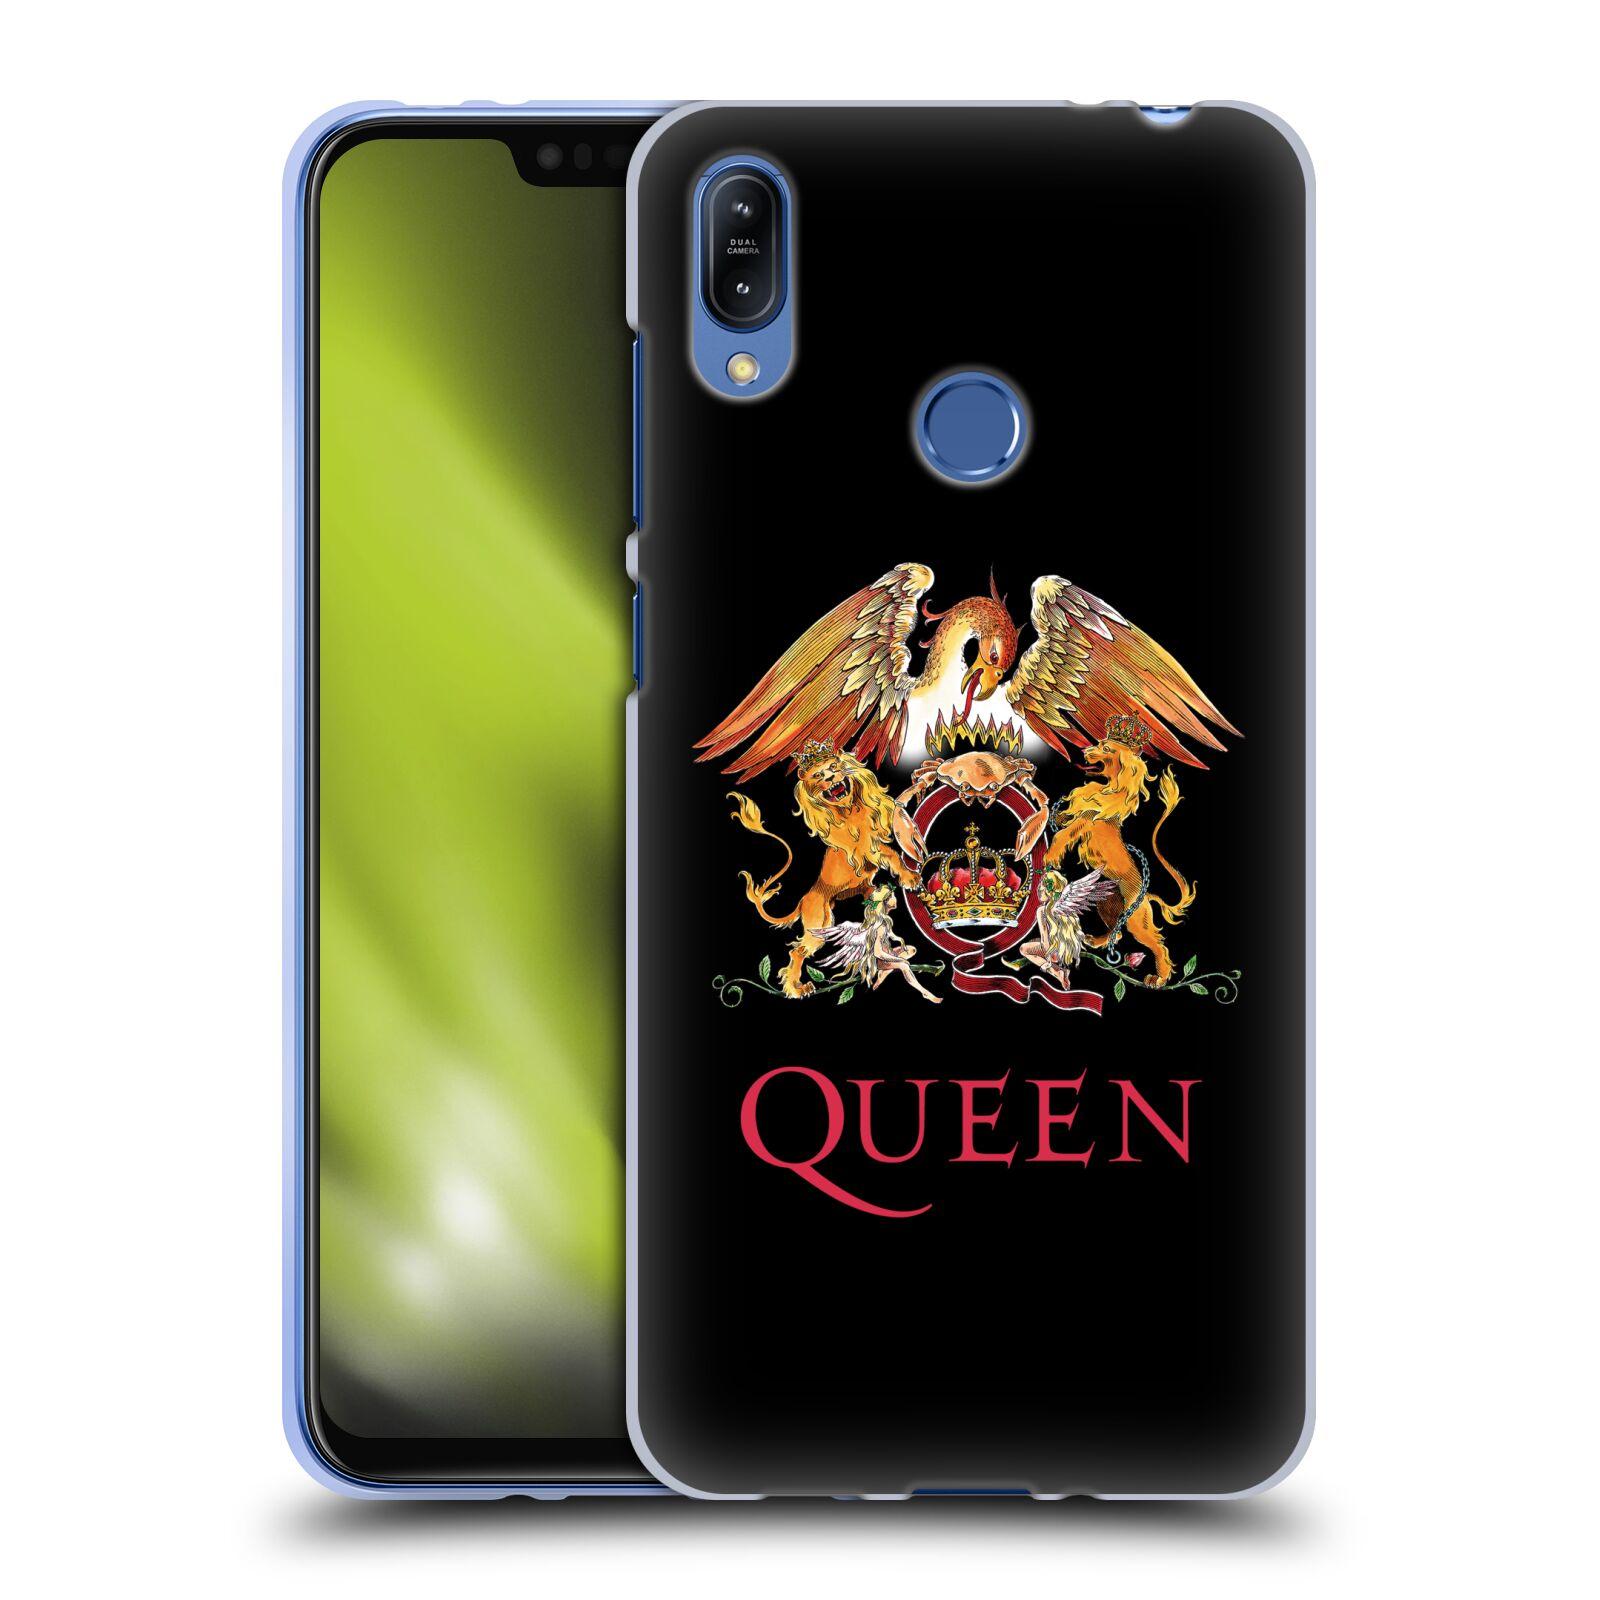 Silikonové pouzdro na mobil Asus Zenfone Max (M2) ZB633KL - Head Case - Queen - Logo